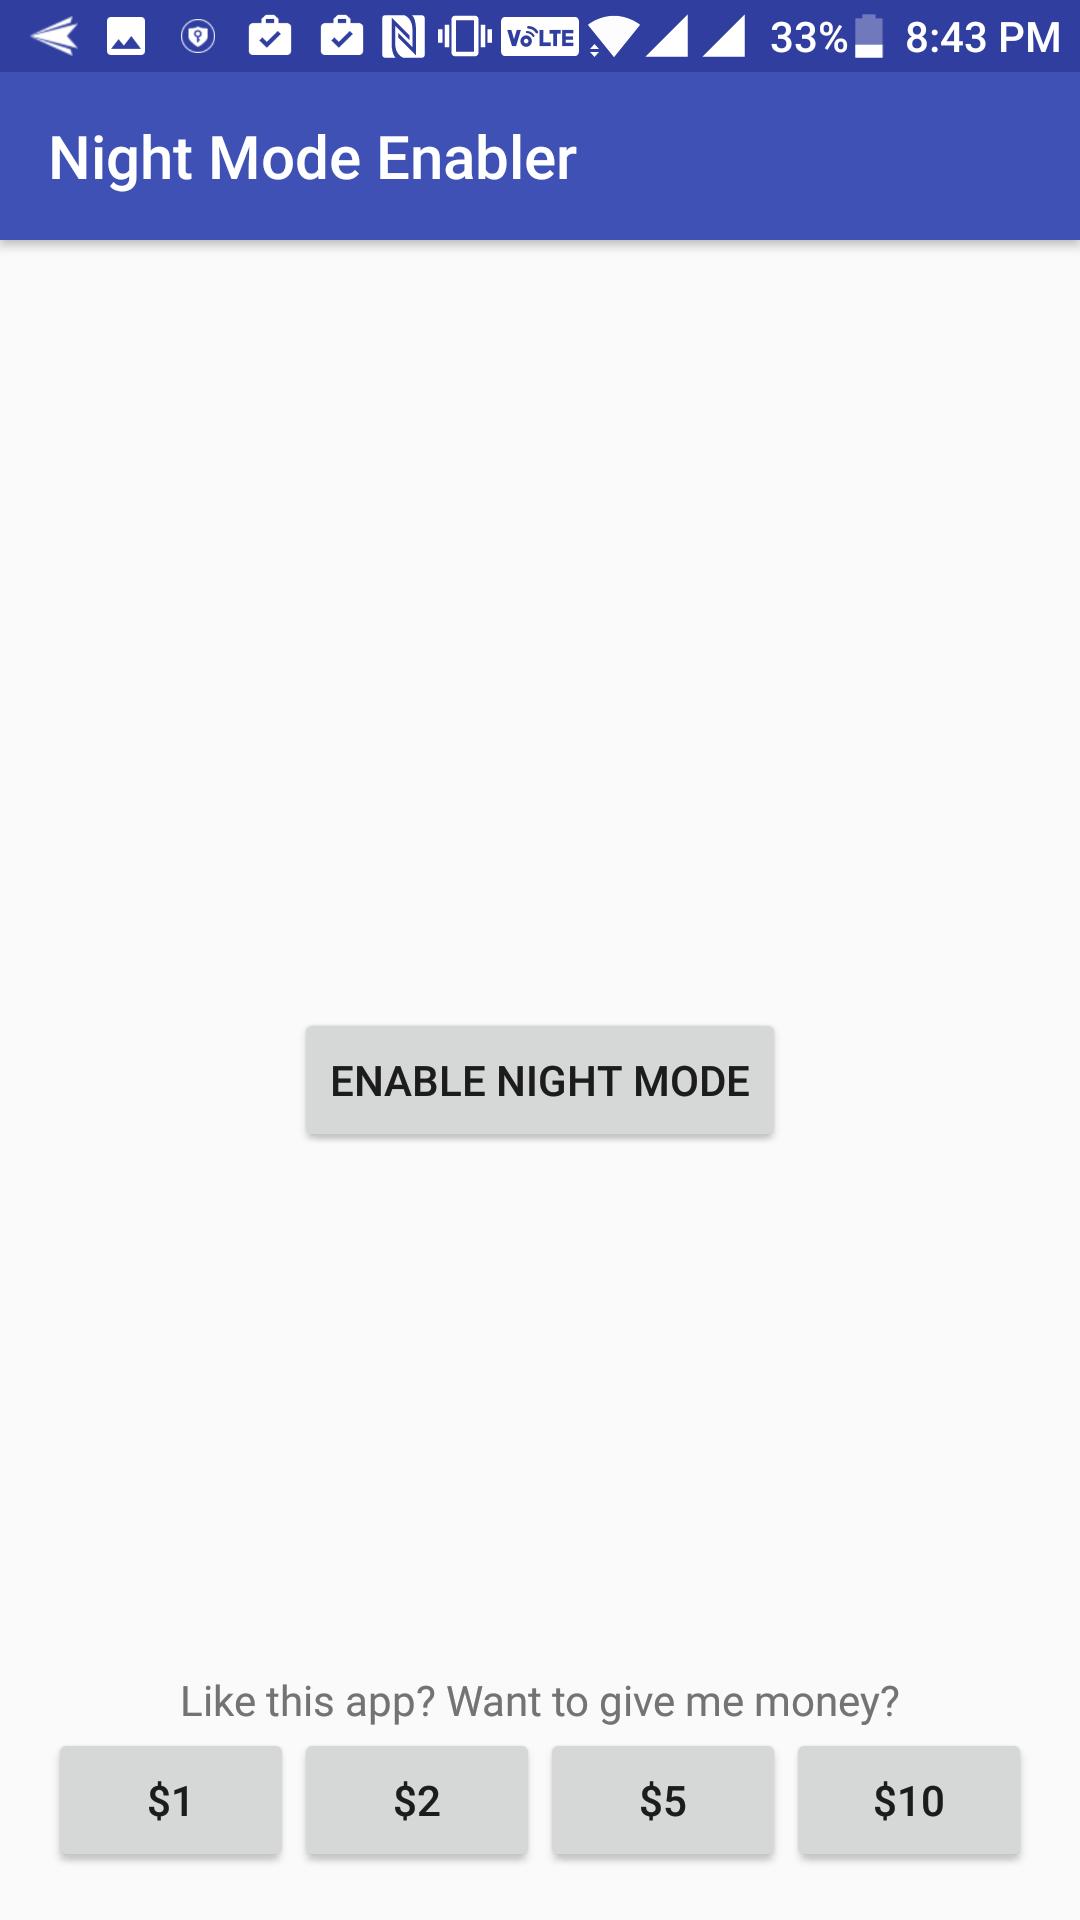 night-mode-enable